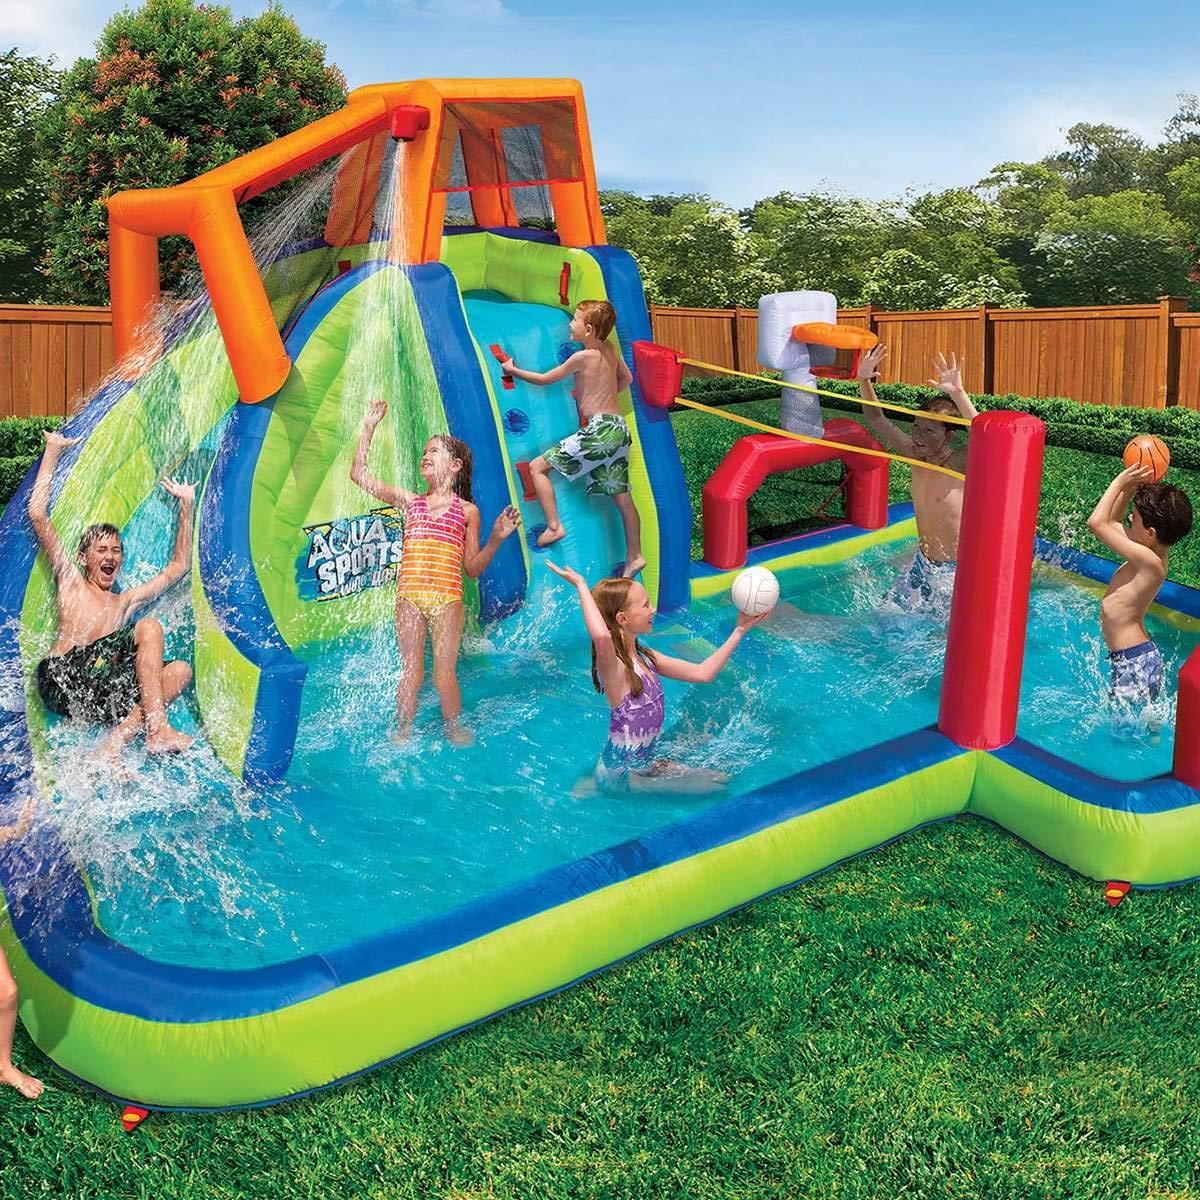 BANZAI Aqua Sports Inflatable Water Park - Buy Online in ...